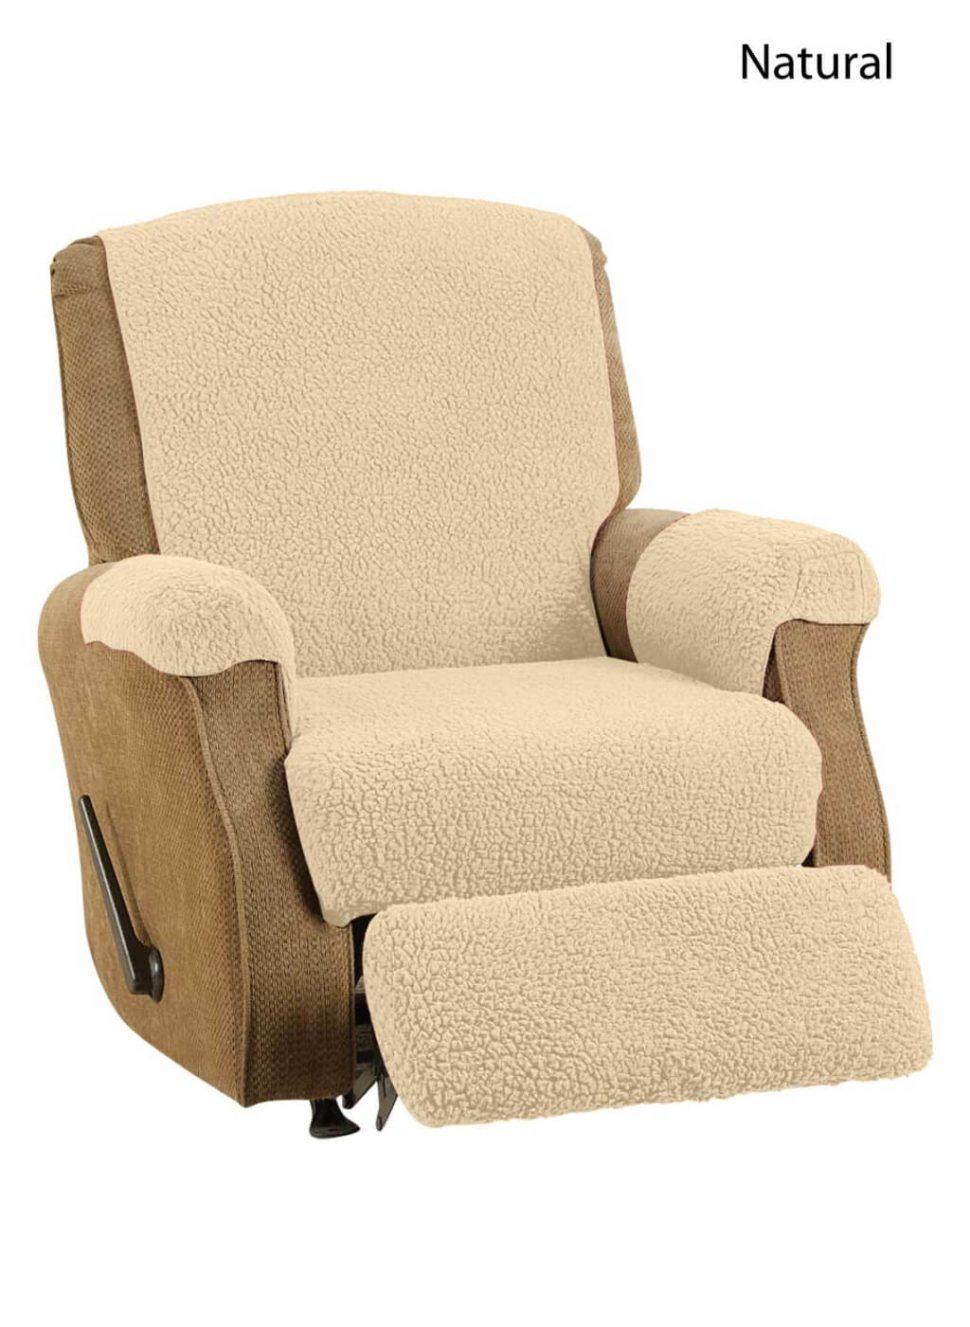 Sofas Center : Awesome Reclining Sofa Slipcover Images For Slipcover For Reclining Sofas (Image 17 of 20)